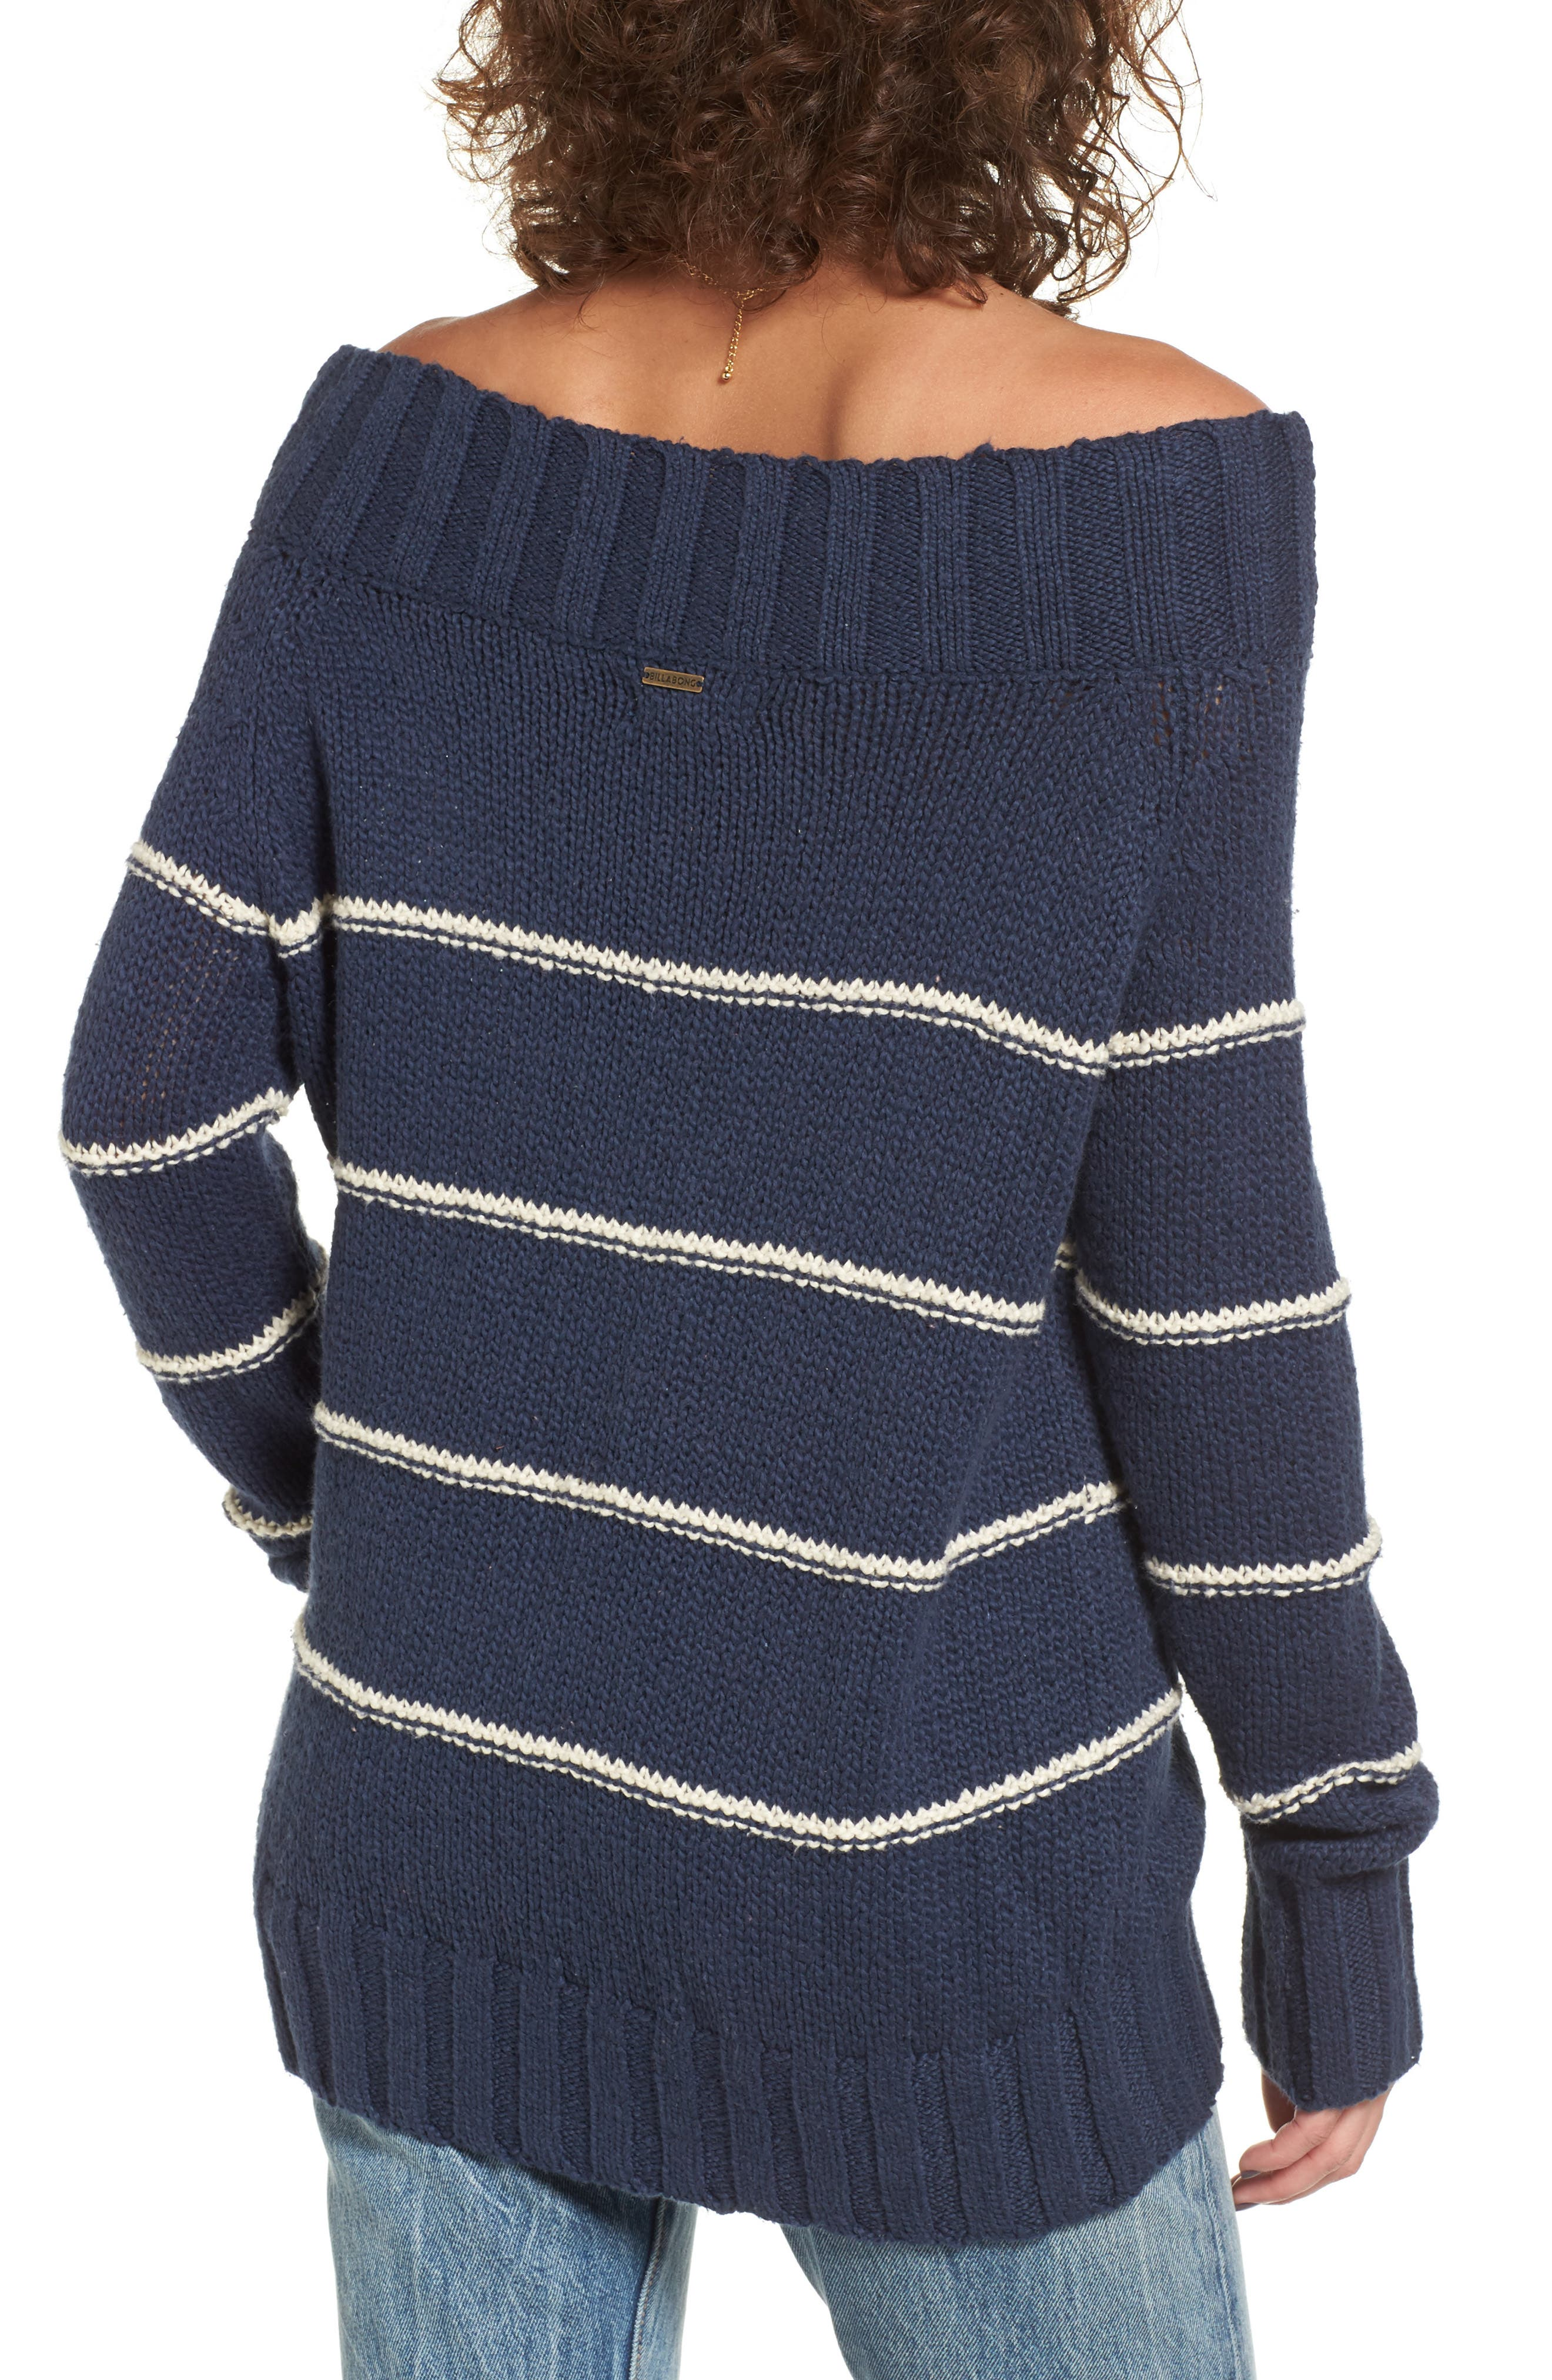 BILLABONG,                             Snuggle Down Off the Shoulder Sweater,                             Alternate thumbnail 2, color,                             400